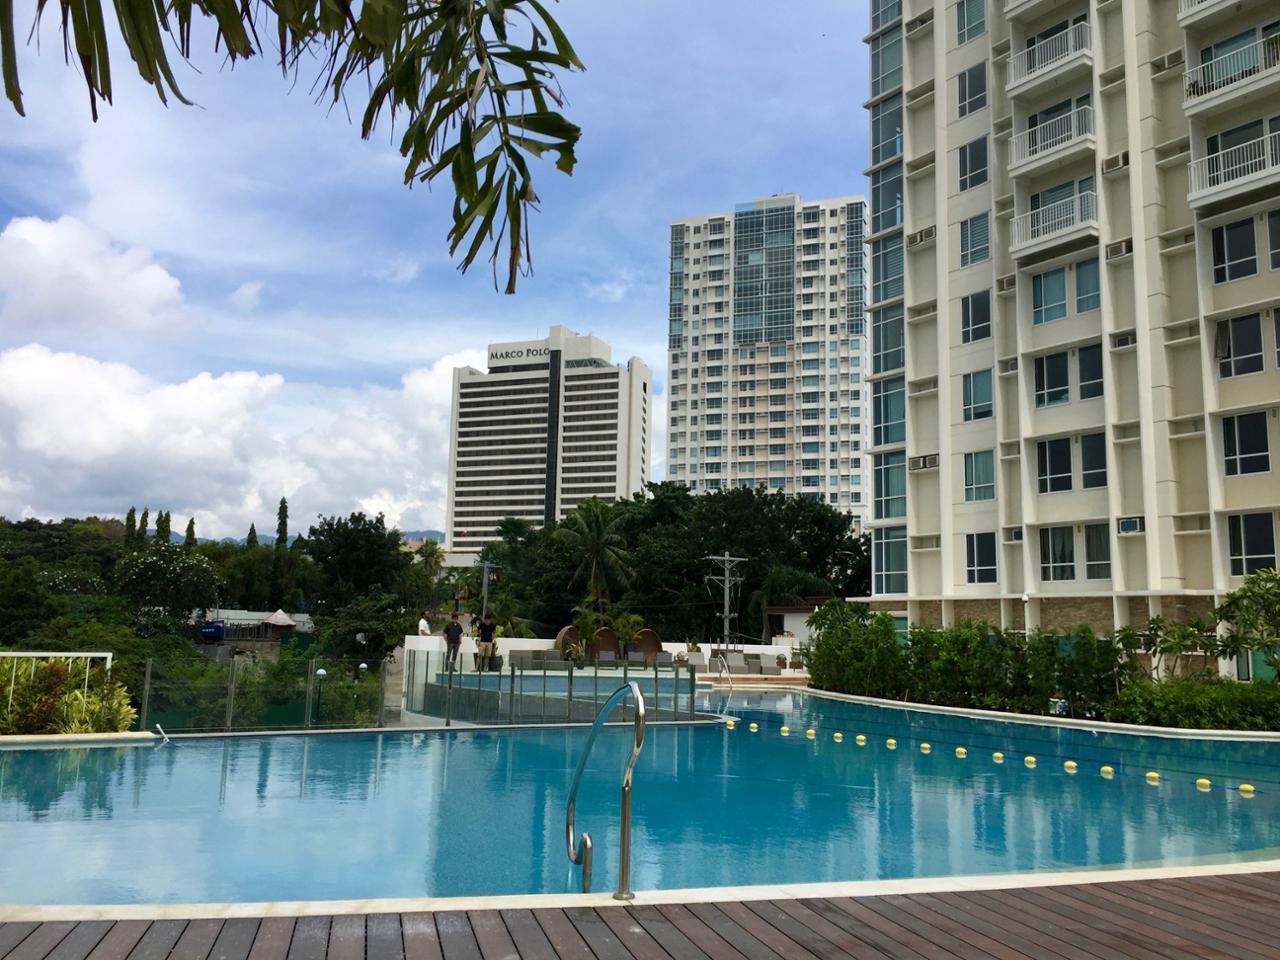 Condominium For Sale in Marco Polo Two Residences, Lahug Cebu City, Lahug, Cebu